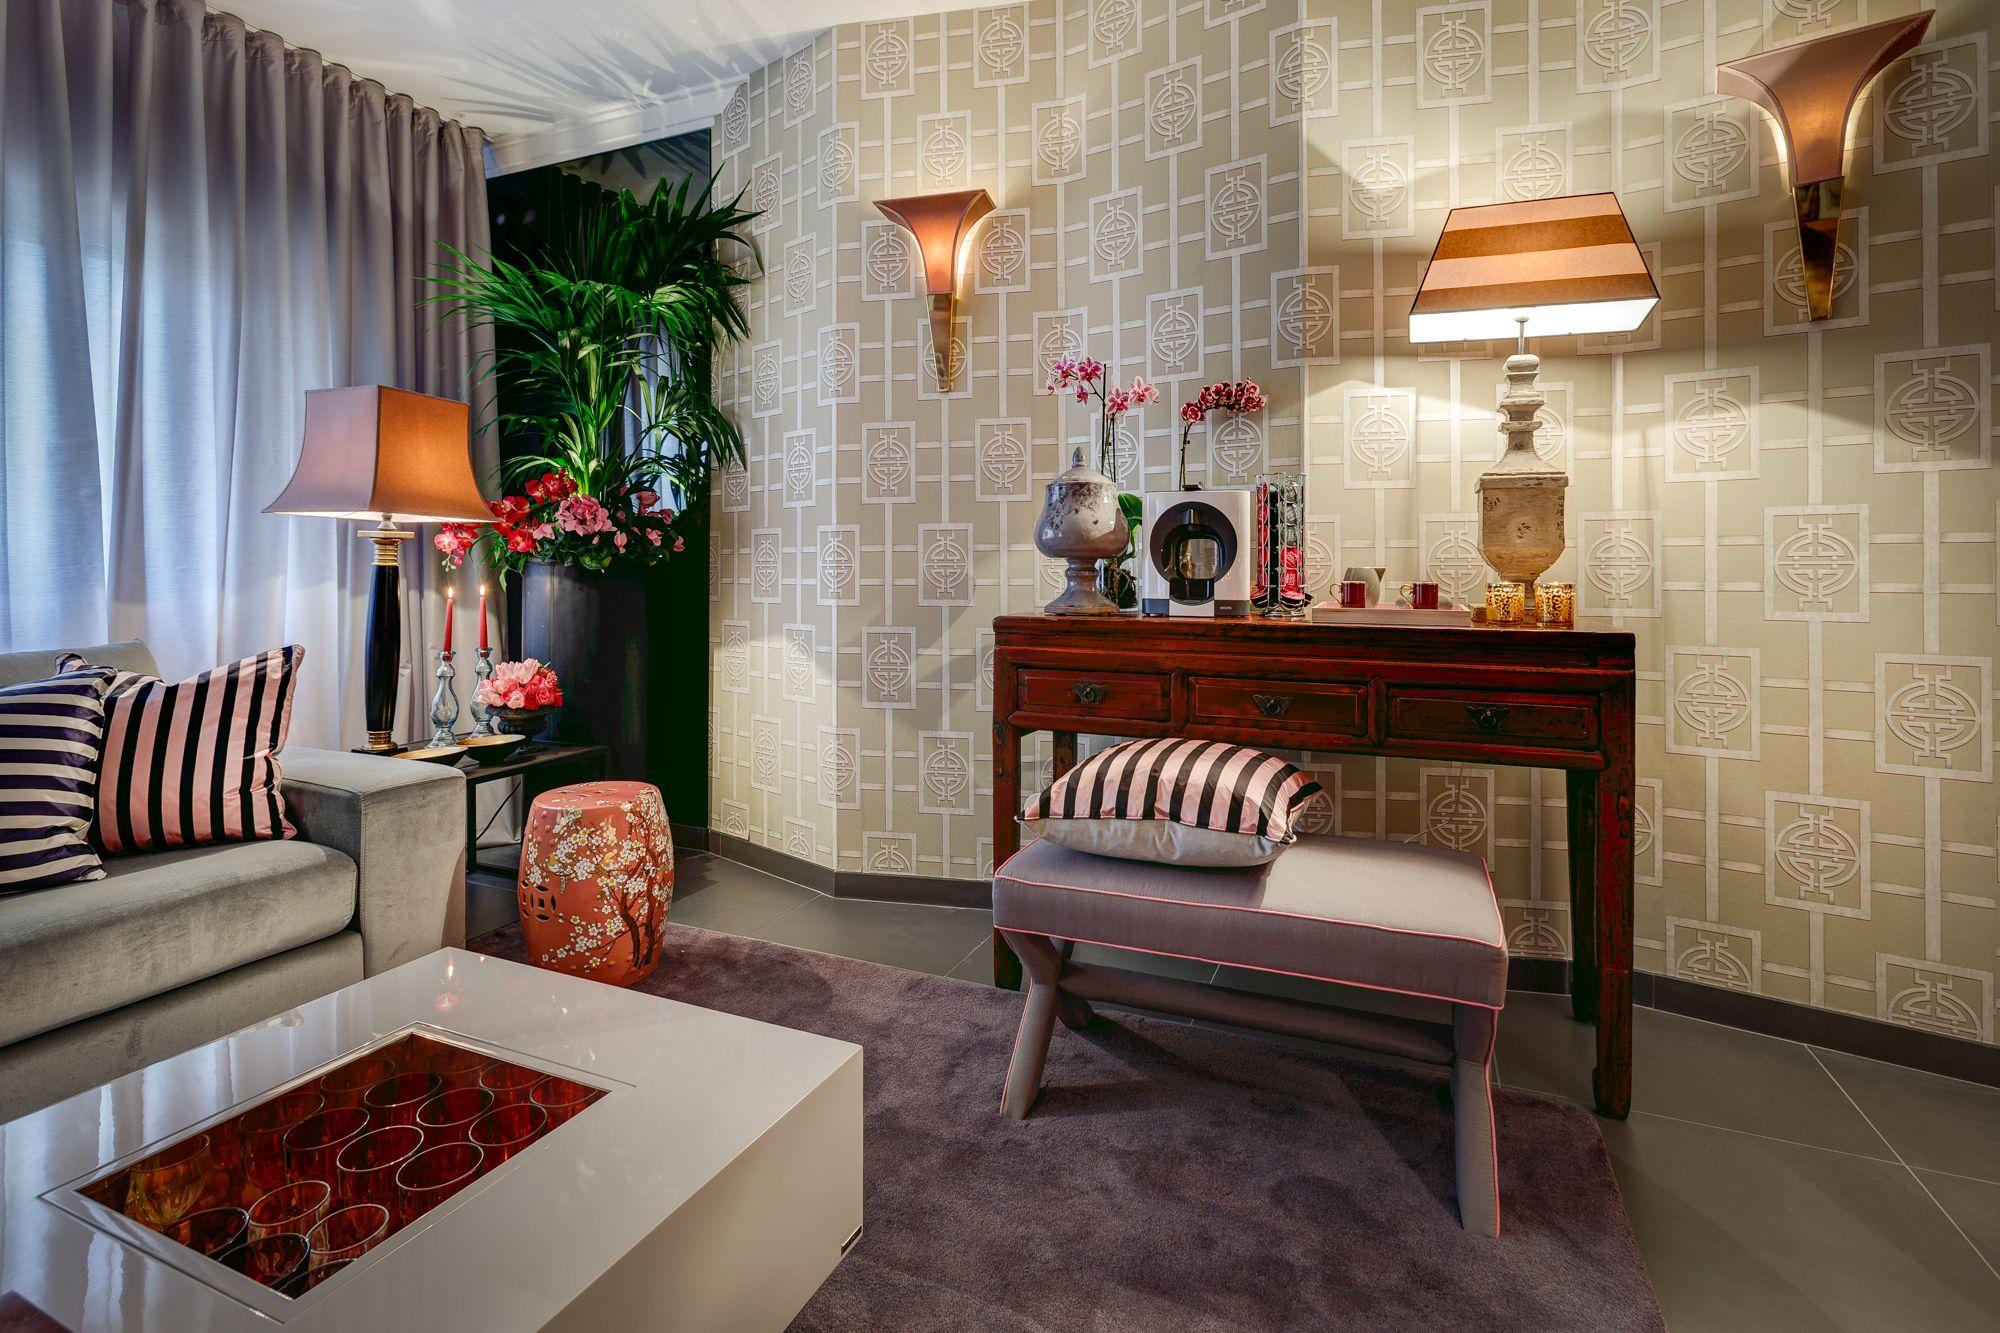 Arquiteto Miguel Da Cunha | Sala De Estar | Living Room | Wallpaper |  Striped Cushions Part 70